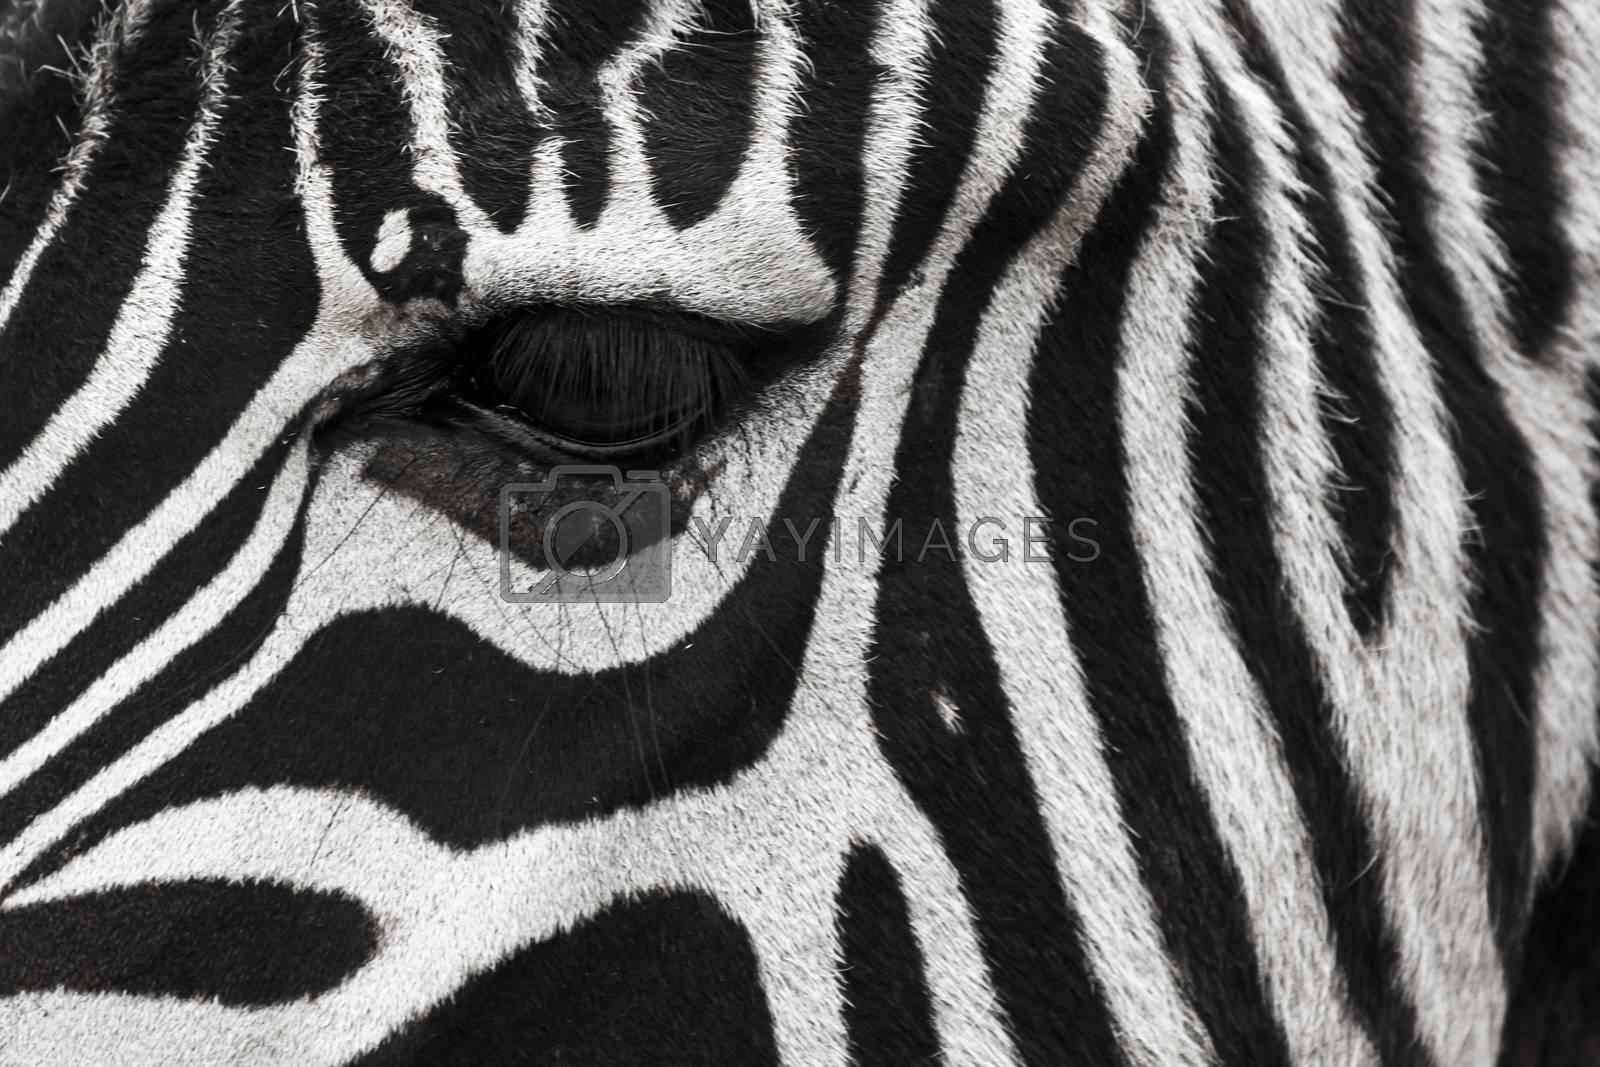 A zebra face with eye up close. Makes a nice background. by petrsvoboda91